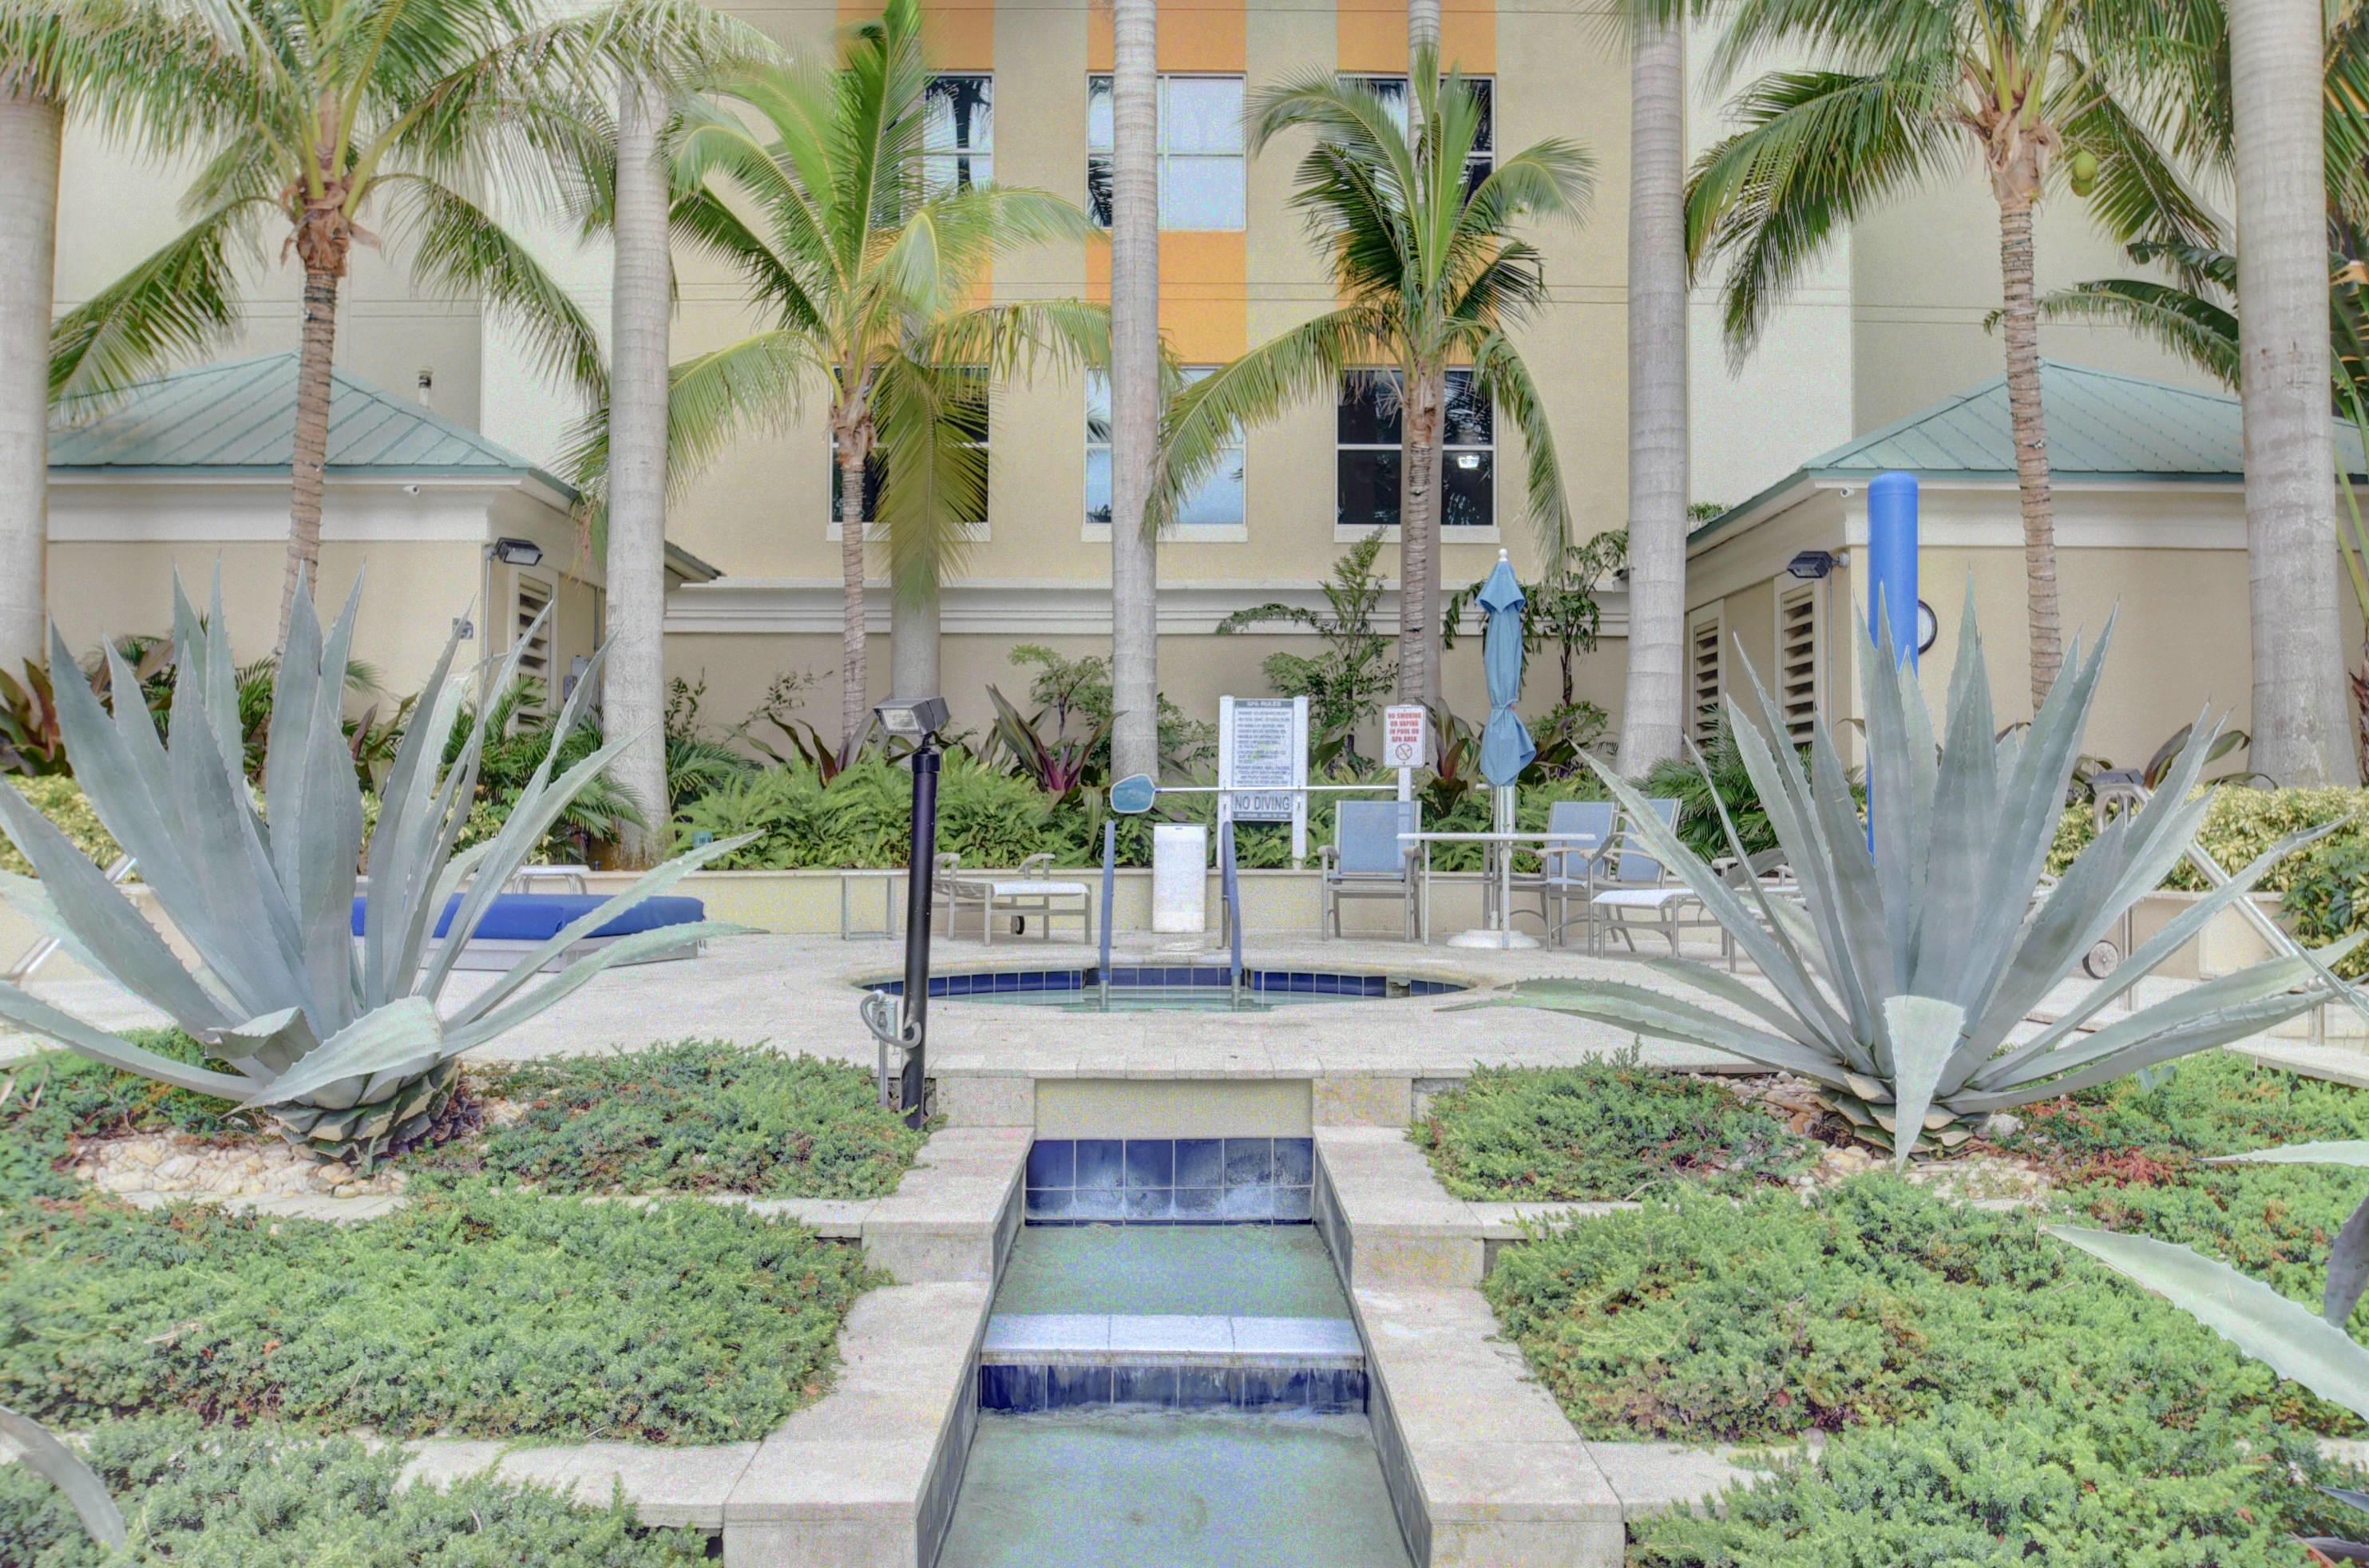 625 Casa Loma Blvd Boulevard Lph9  Boynton Beach FL 33435